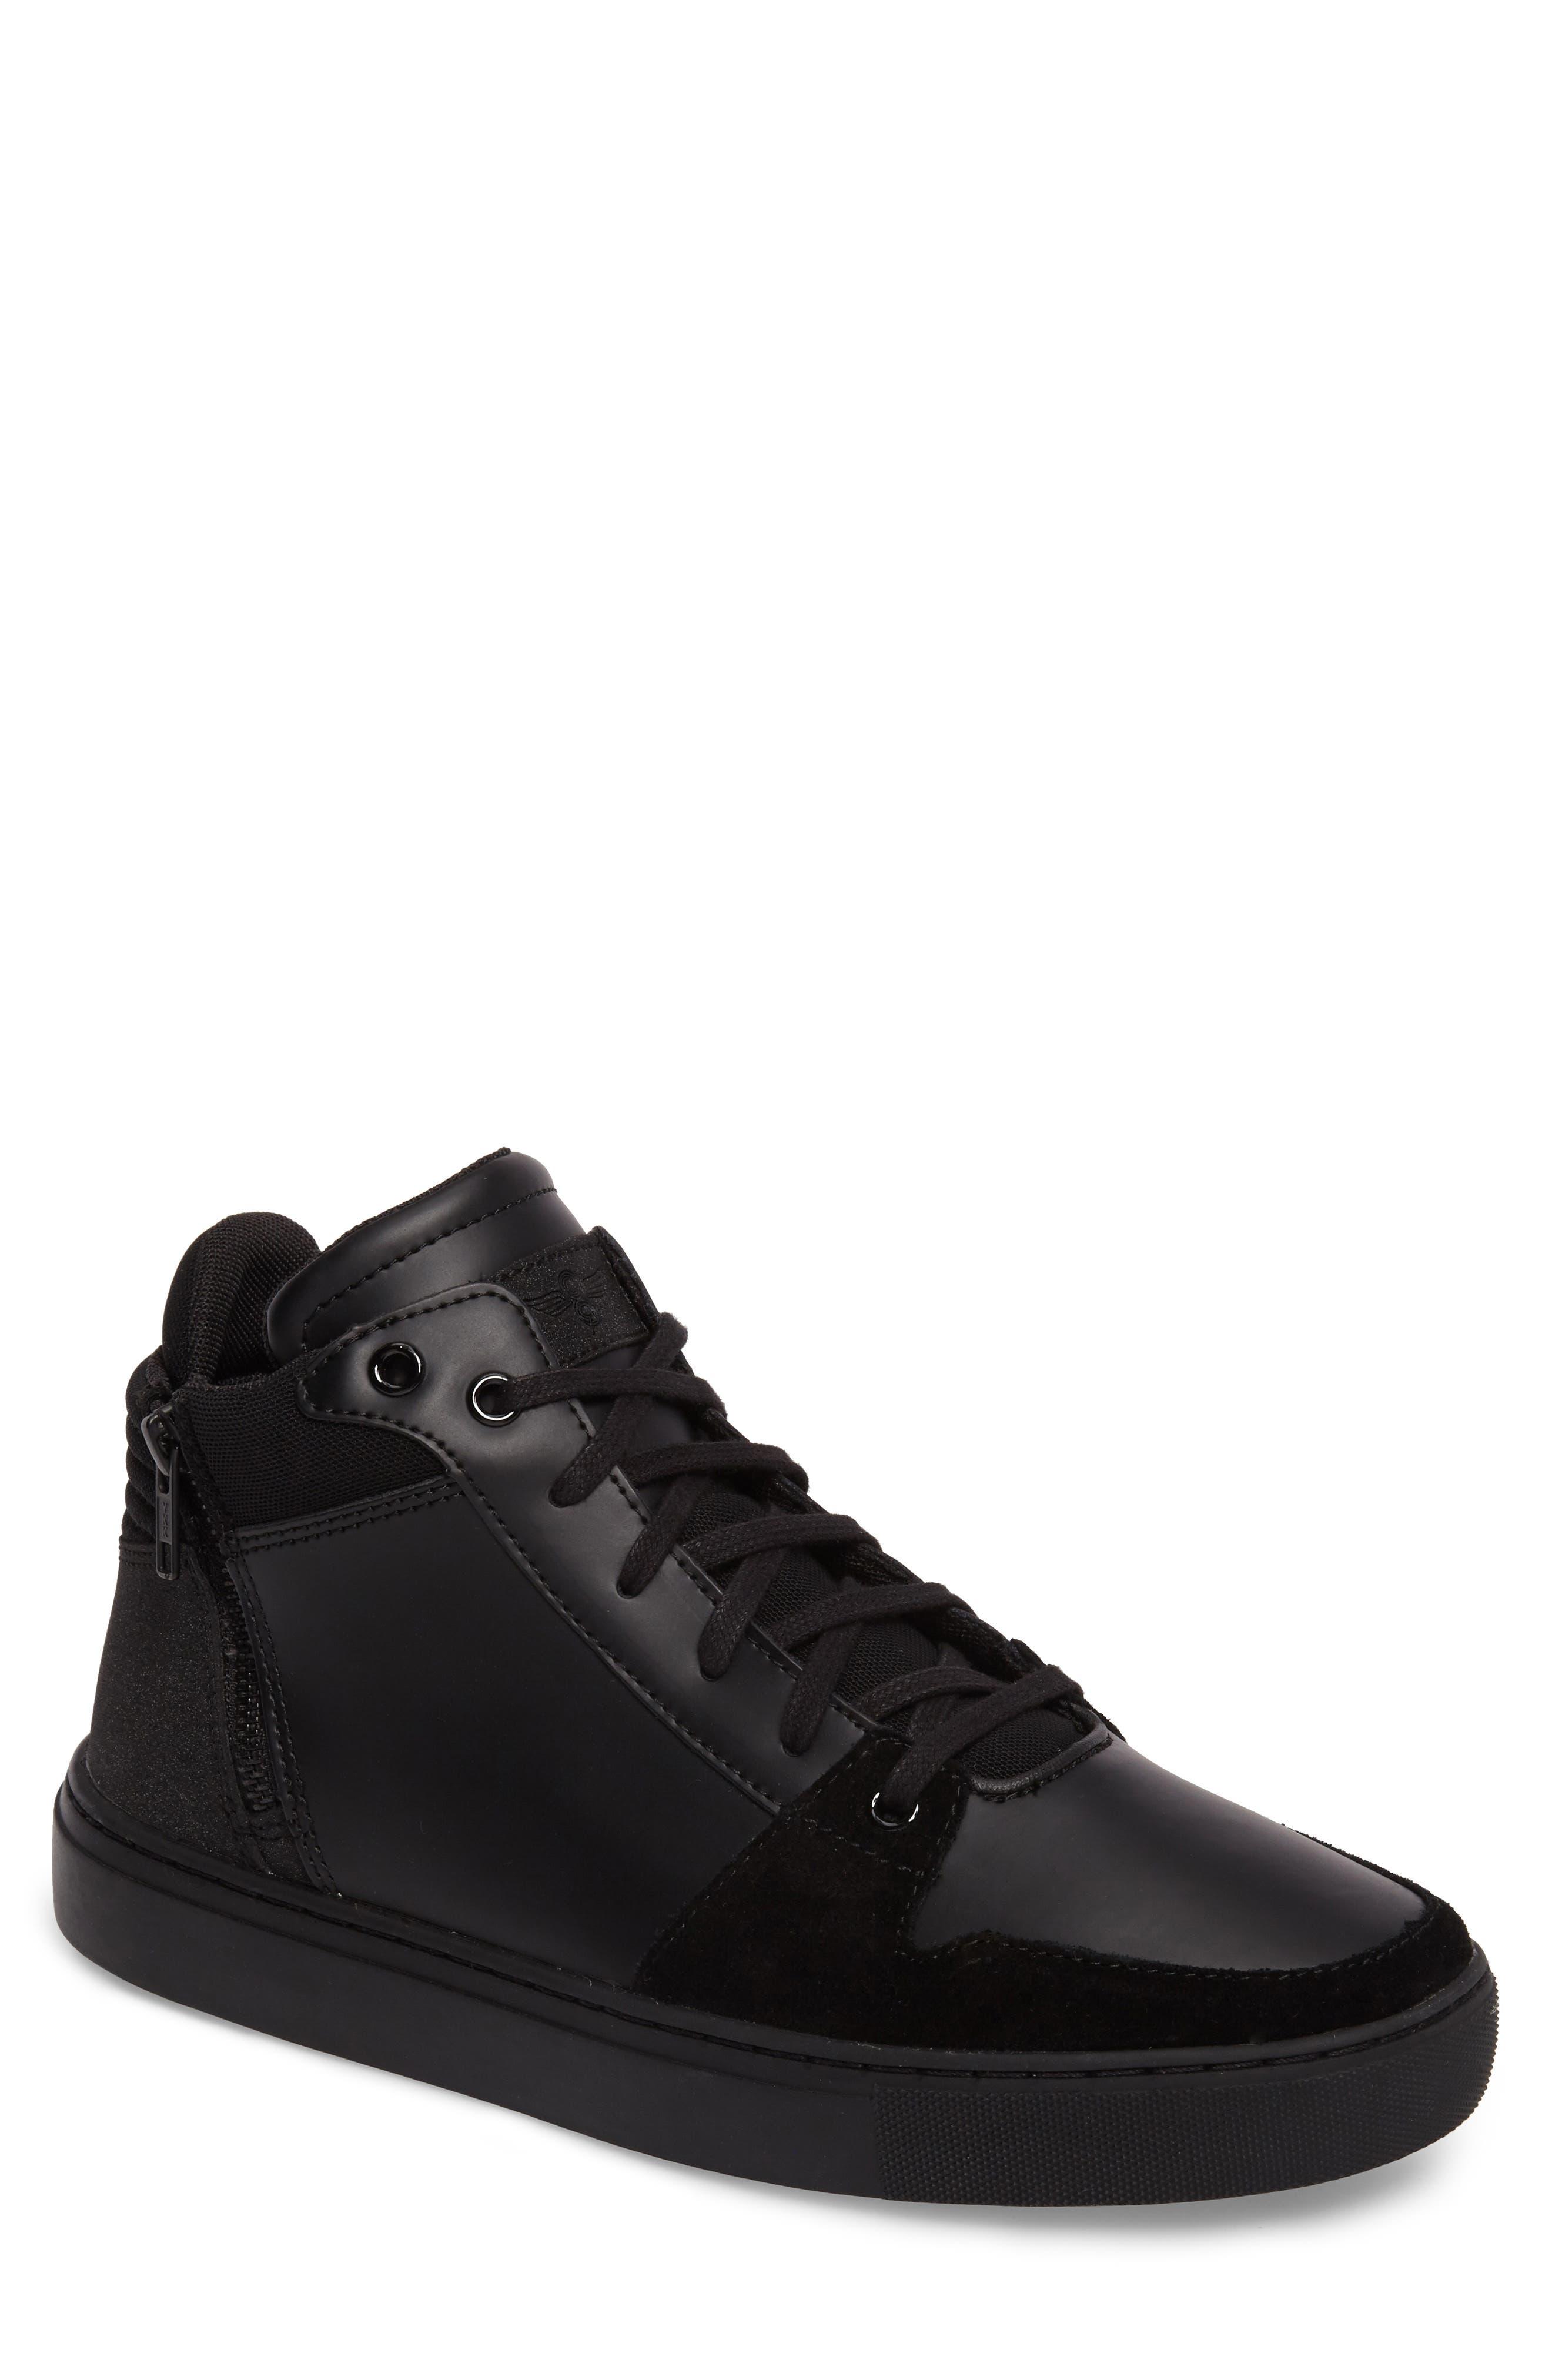 Modena Sneaker,                             Main thumbnail 1, color,